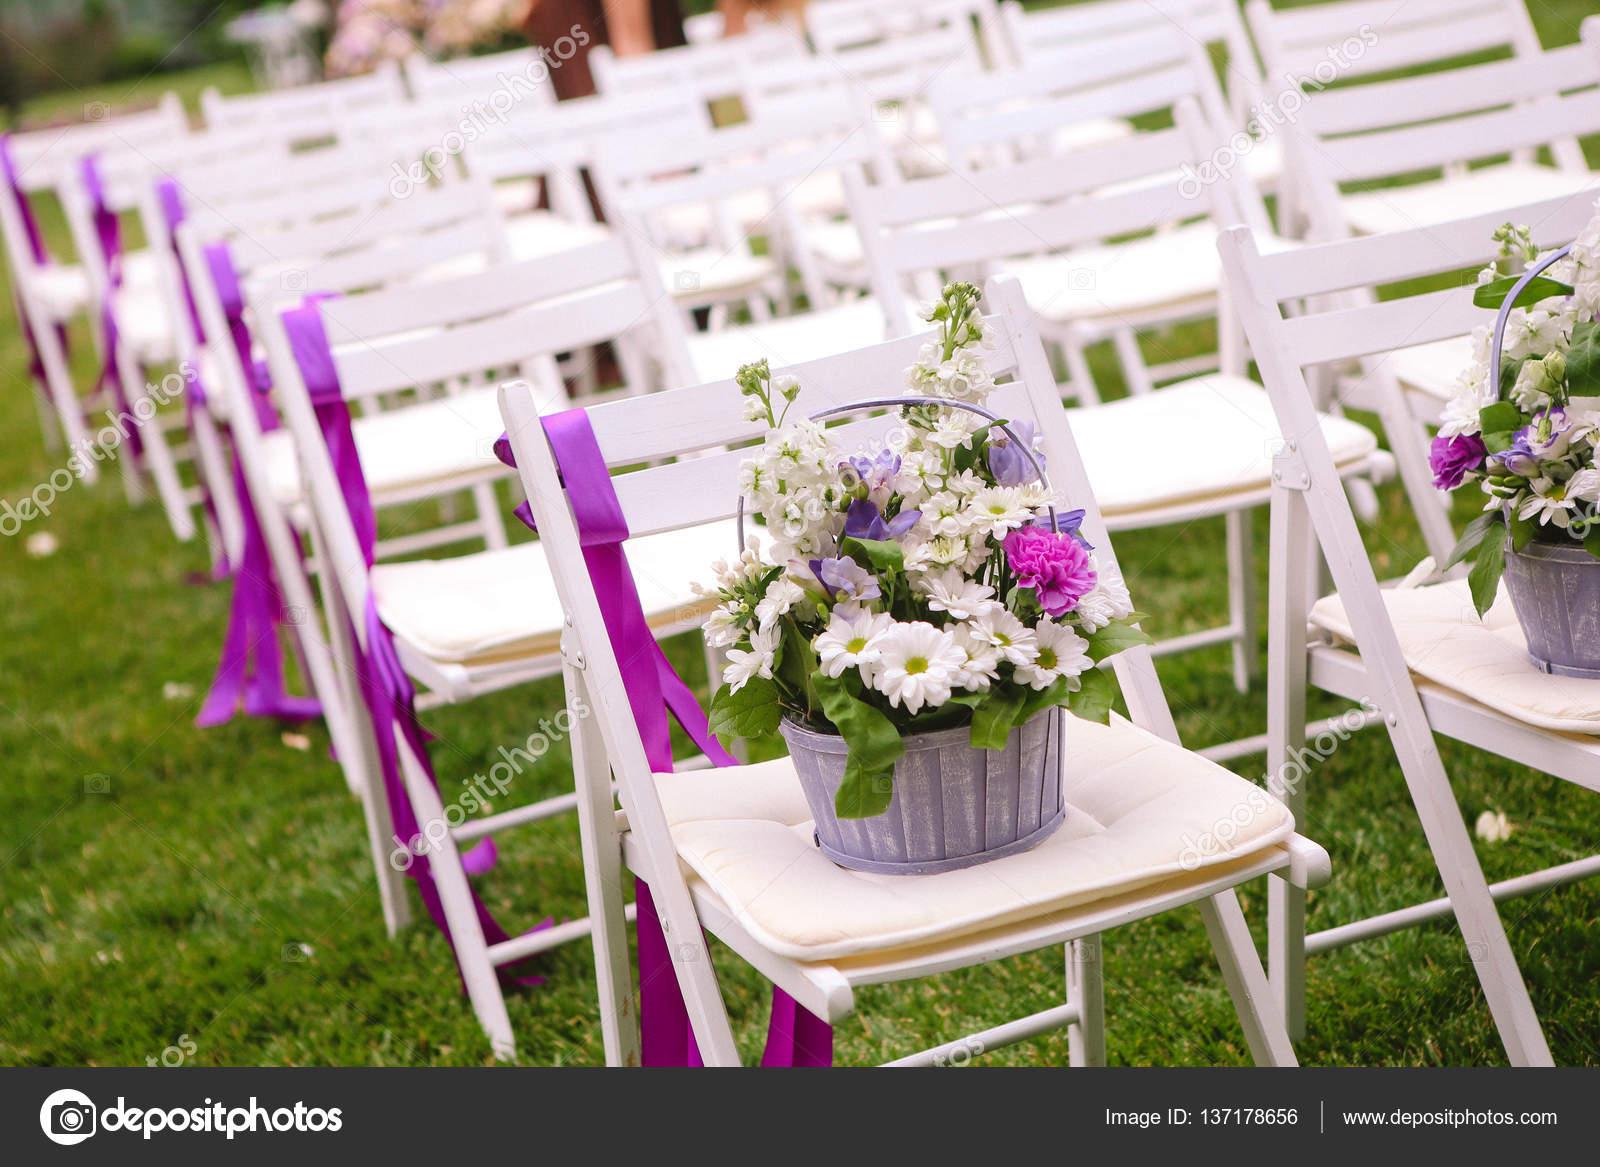 rentals wedding folding phoenix az chairs padded chair rental scottsdale products